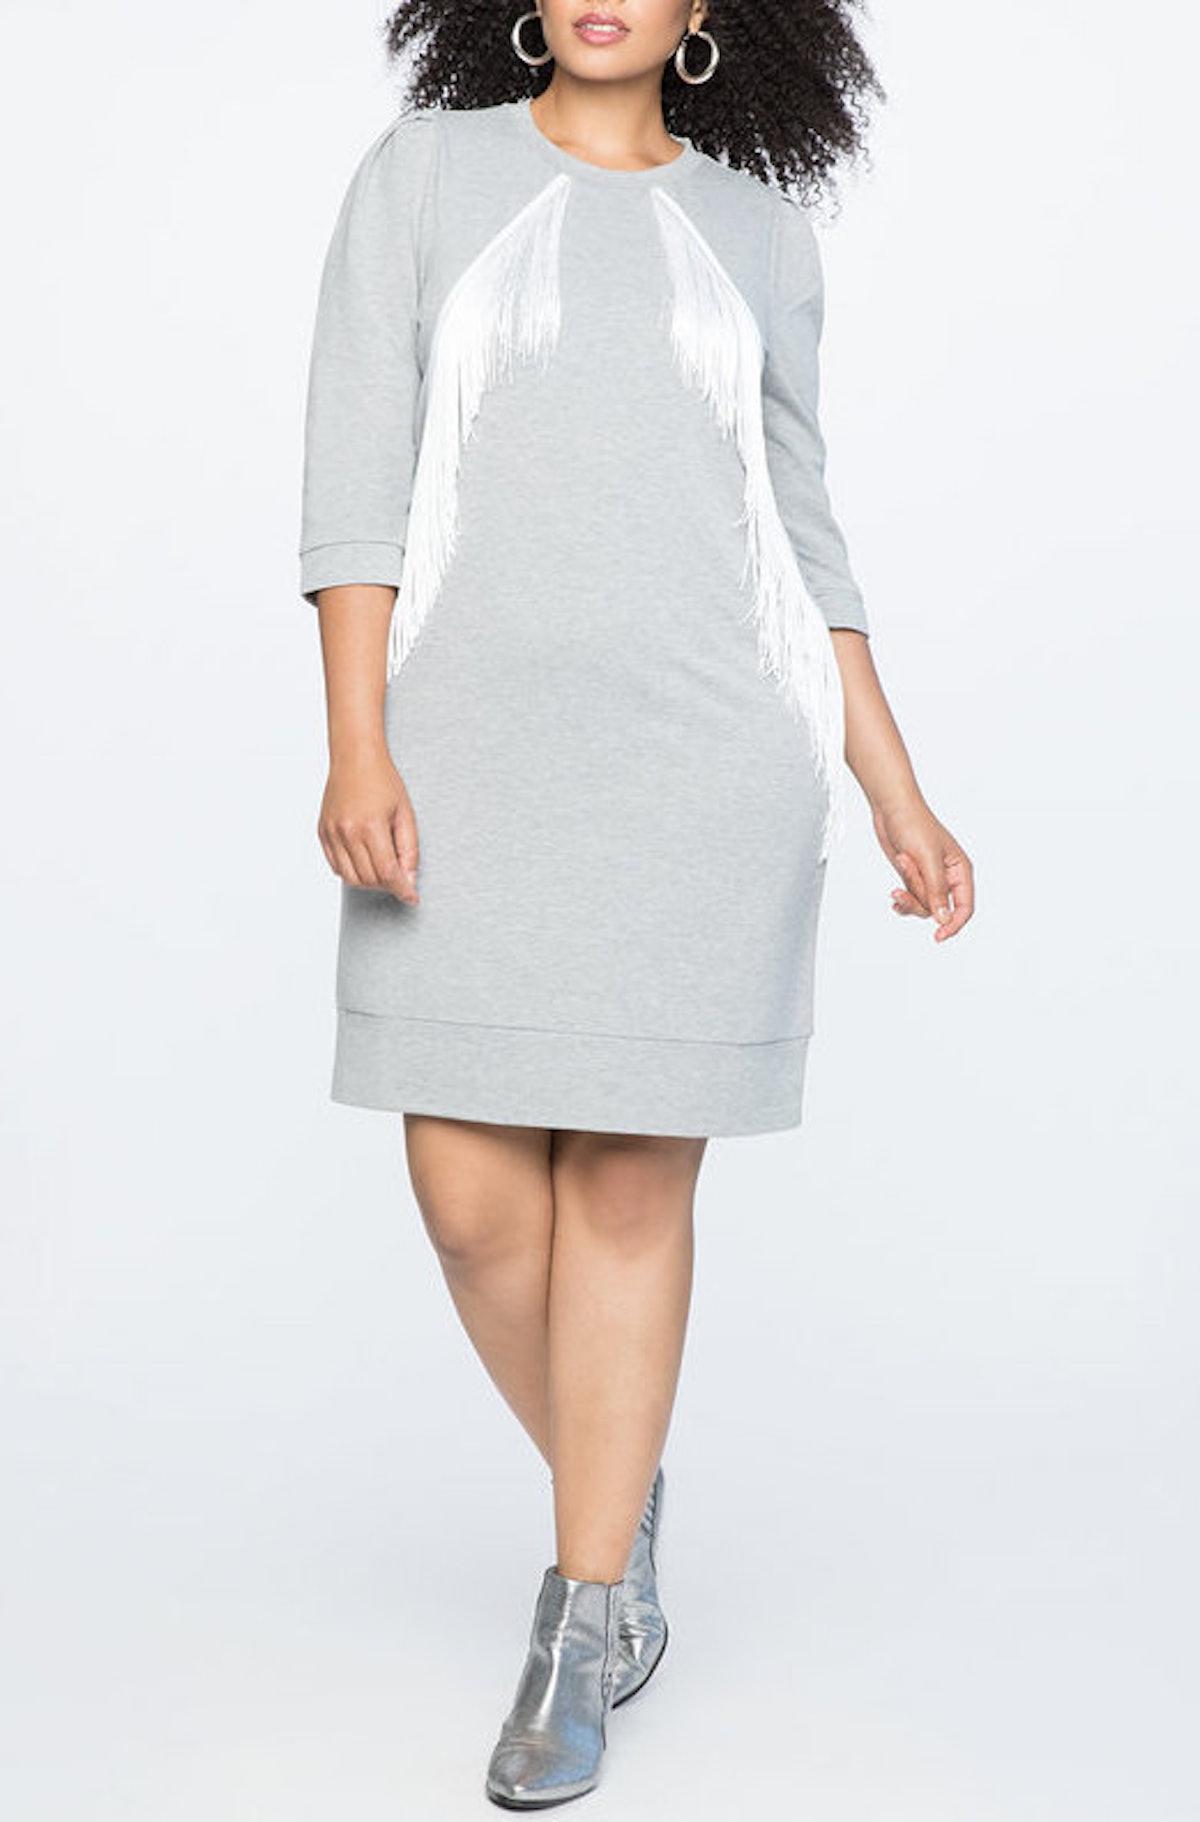 Fringe Detail Shift Dress